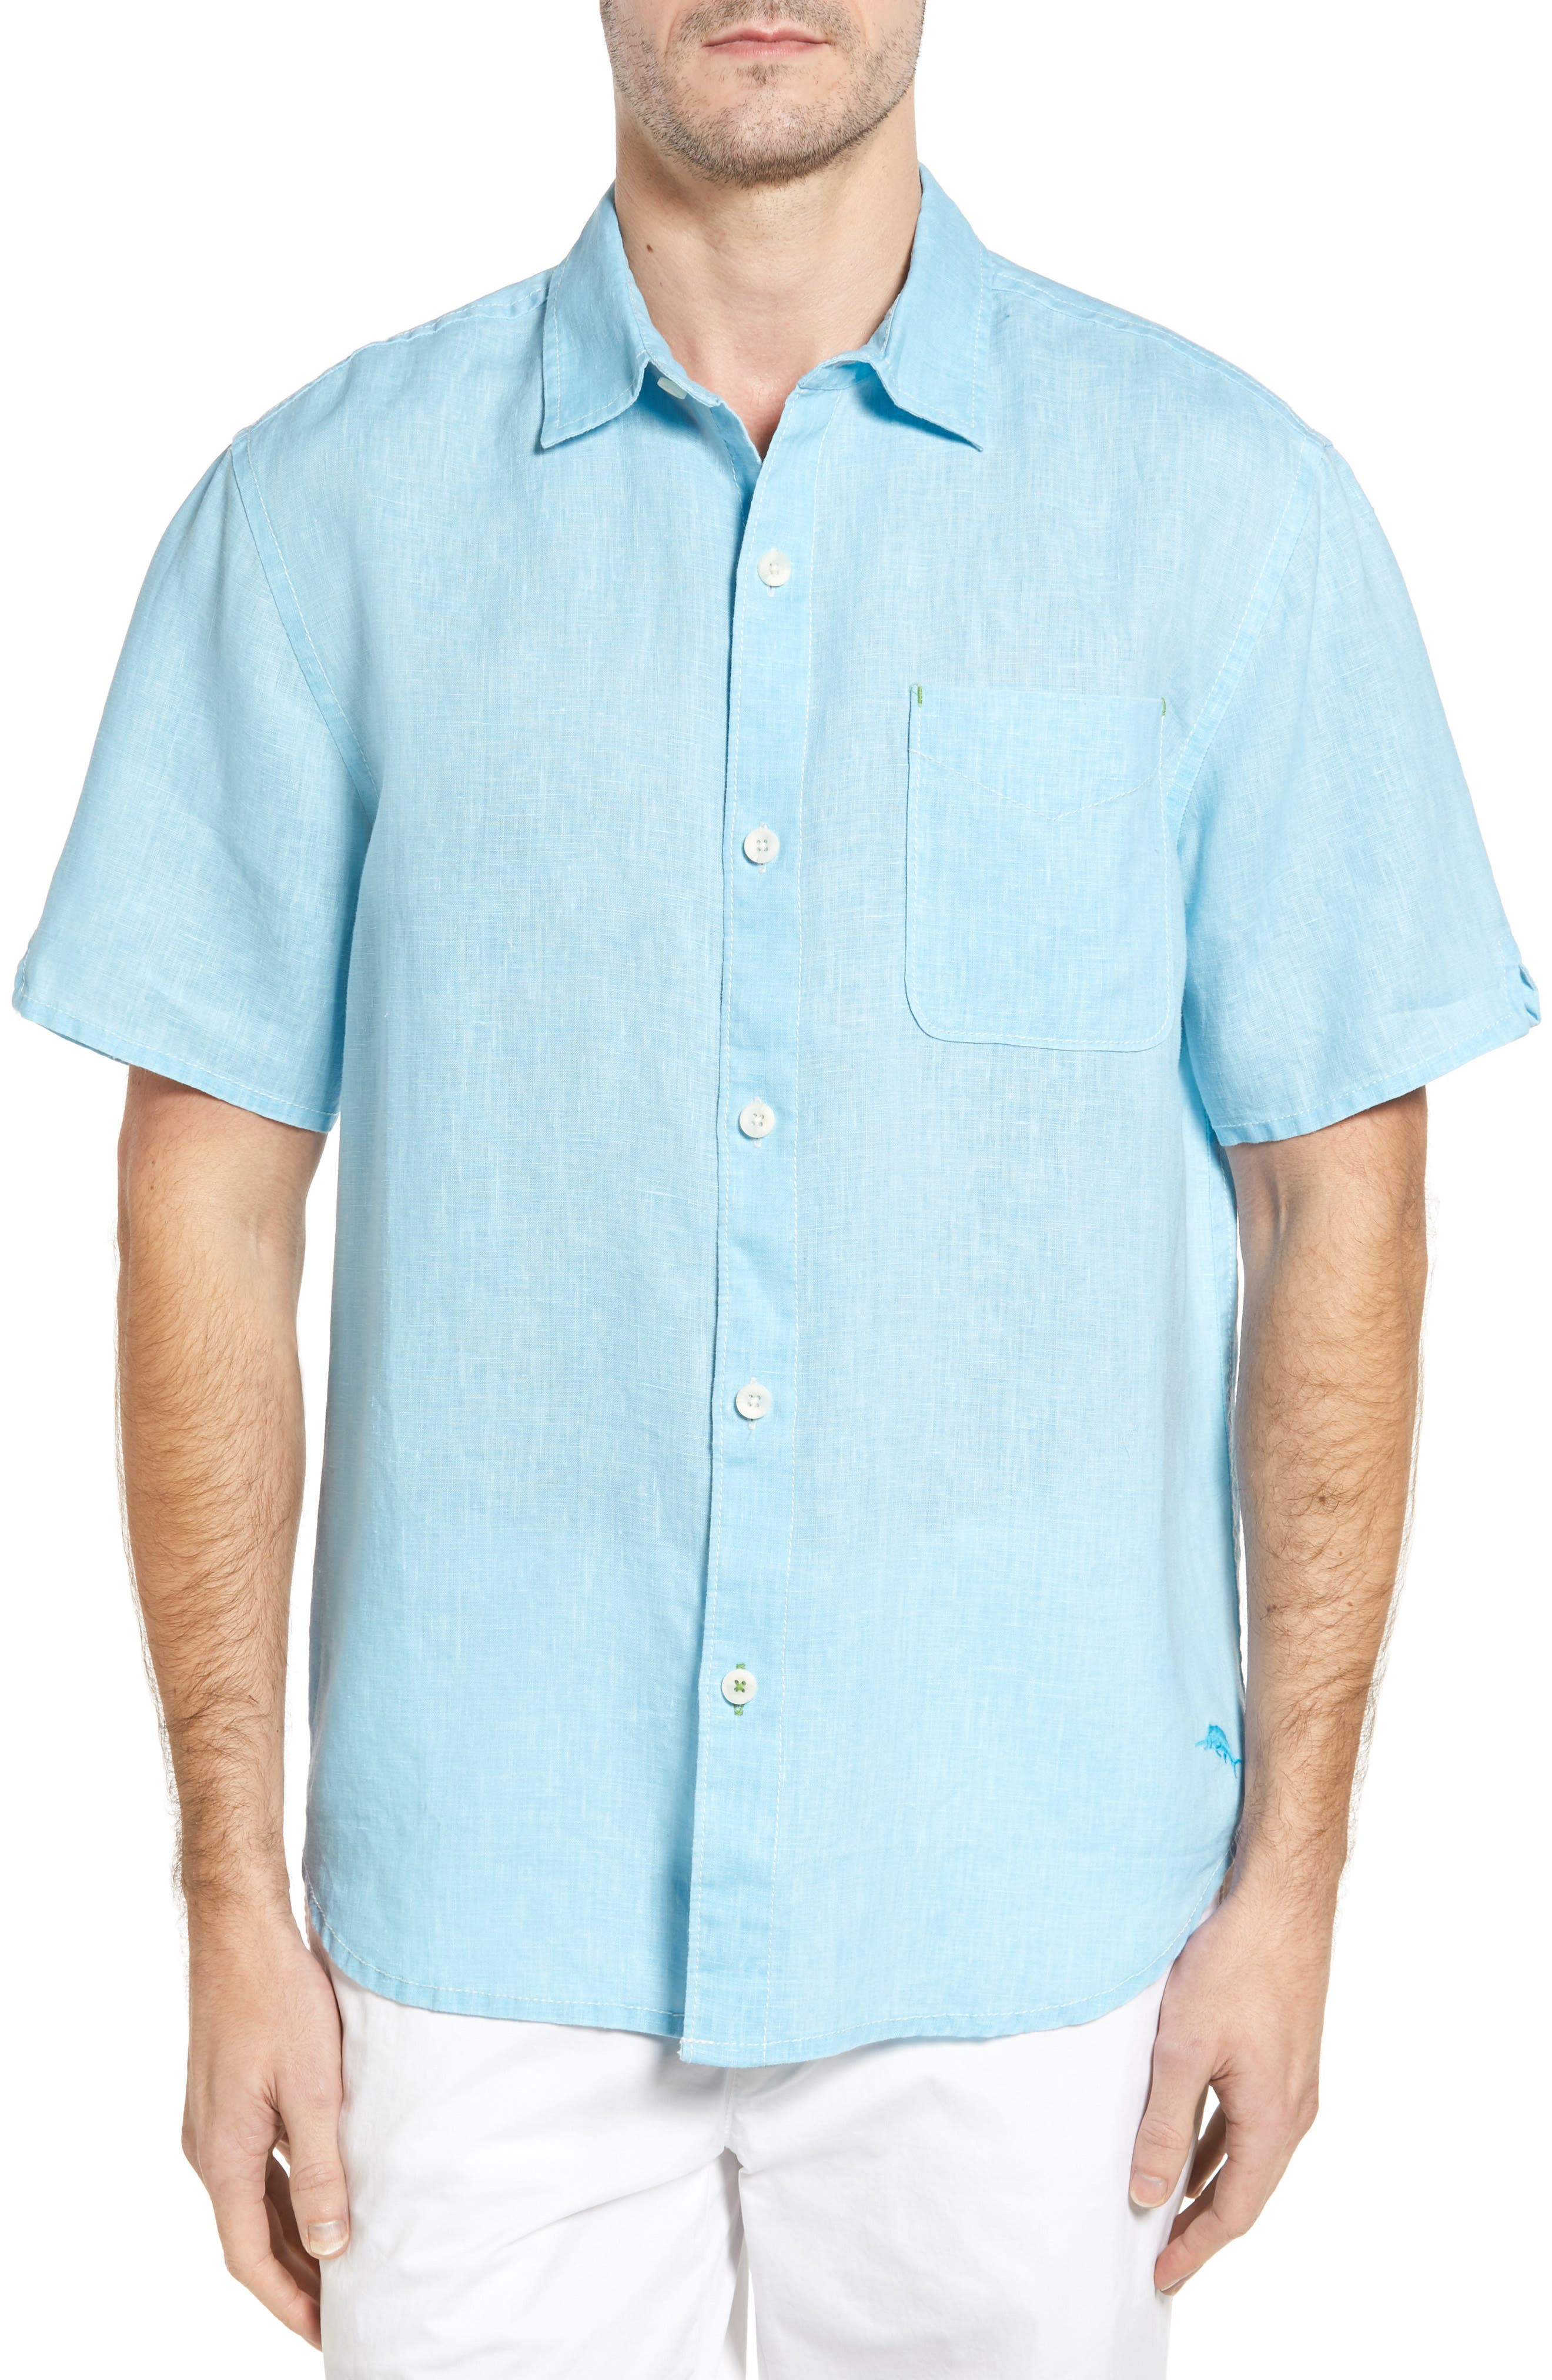 Main Image - Tommy Bahama Seaglass Breezer Short Sleeve Linen Sport Shirt